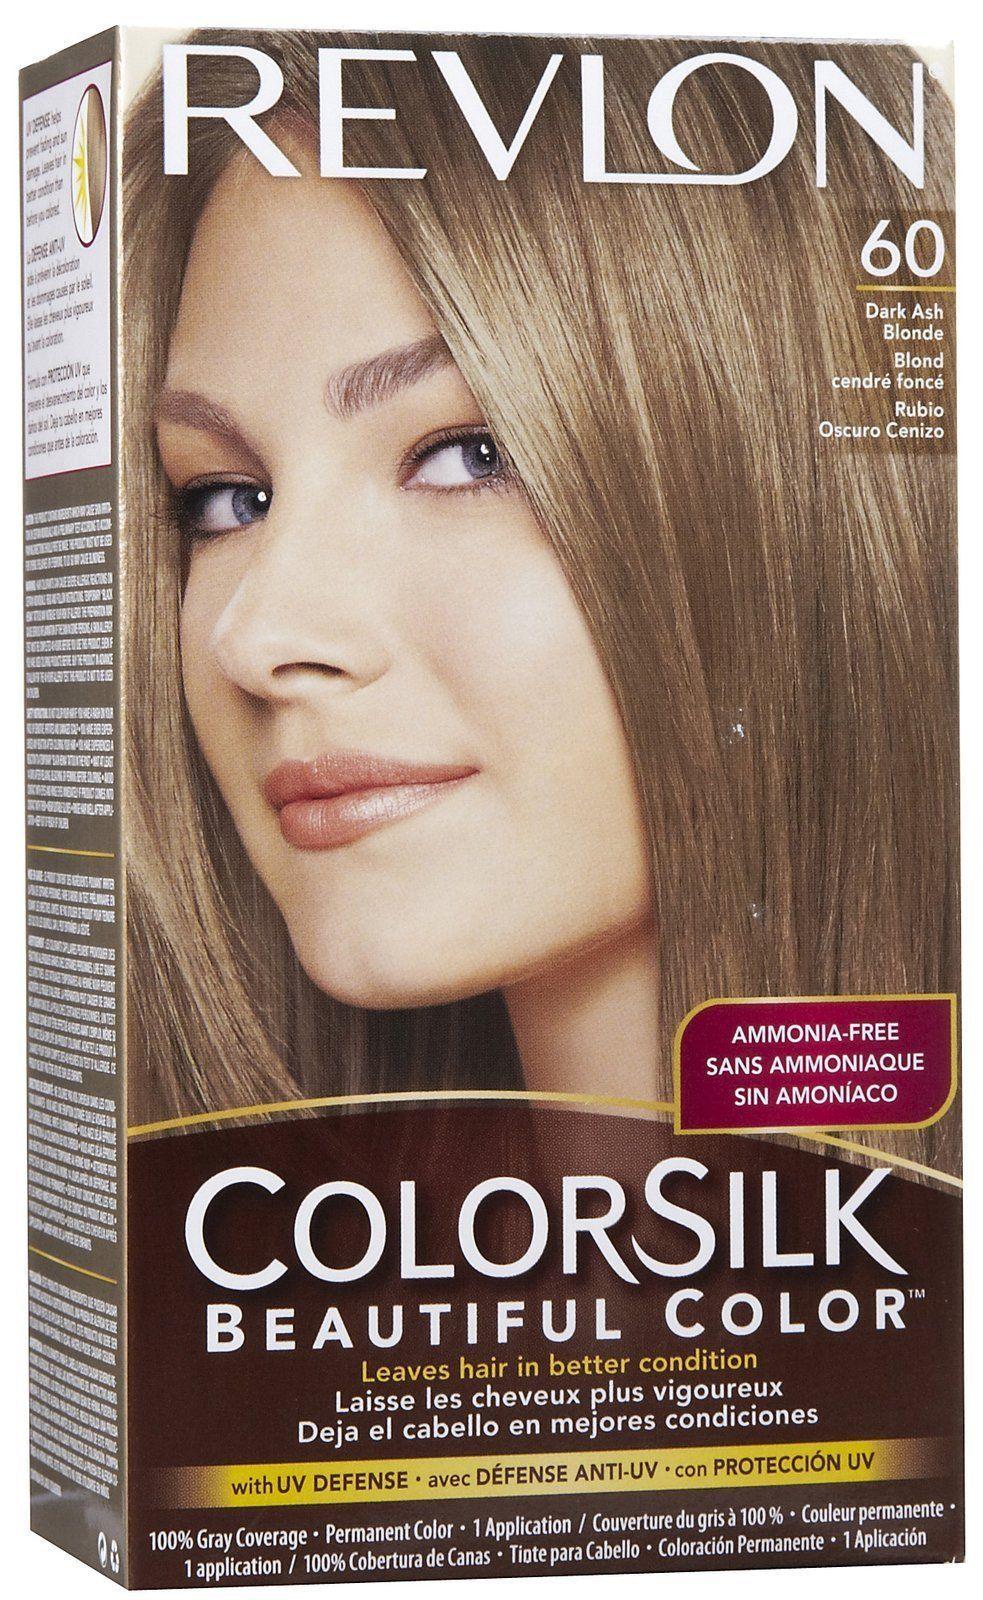 Revlon Colorsilk Hair Color 60 Dark Ash Blonde 3 Pack In 2018